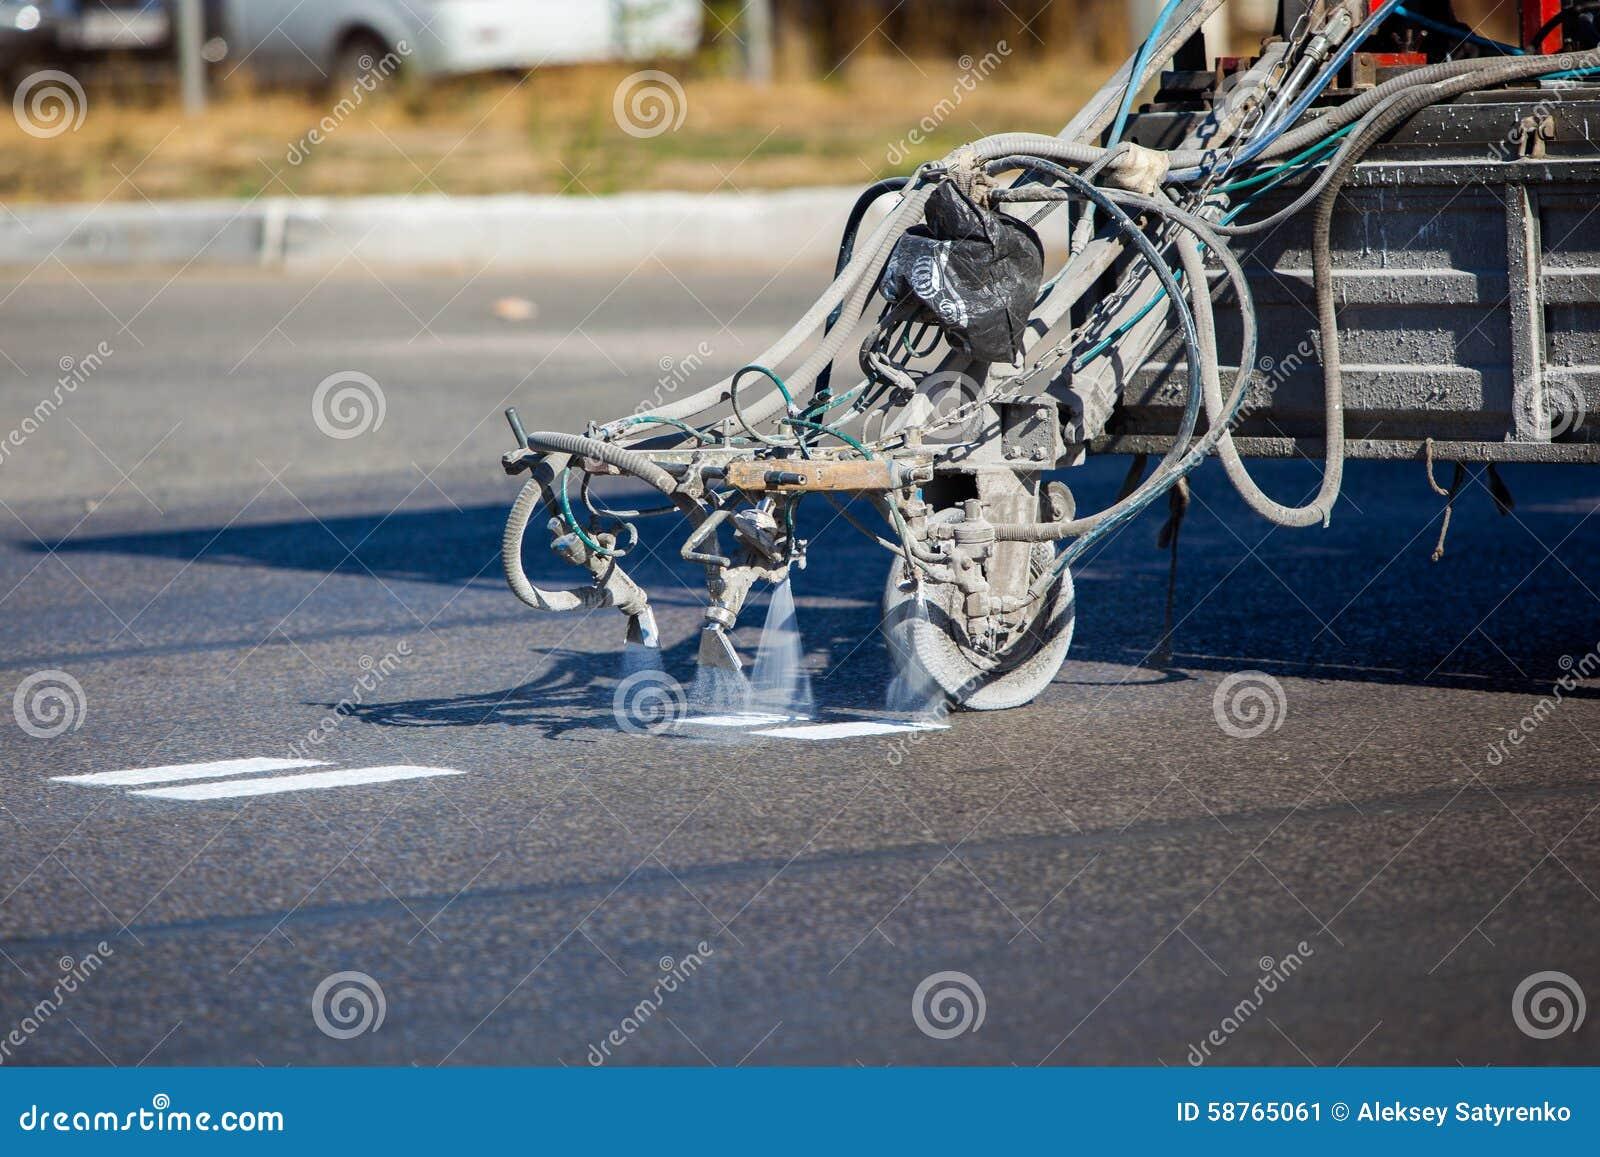 teamwork pavement asphalt road marking paint and stock photo image. Black Bedroom Furniture Sets. Home Design Ideas